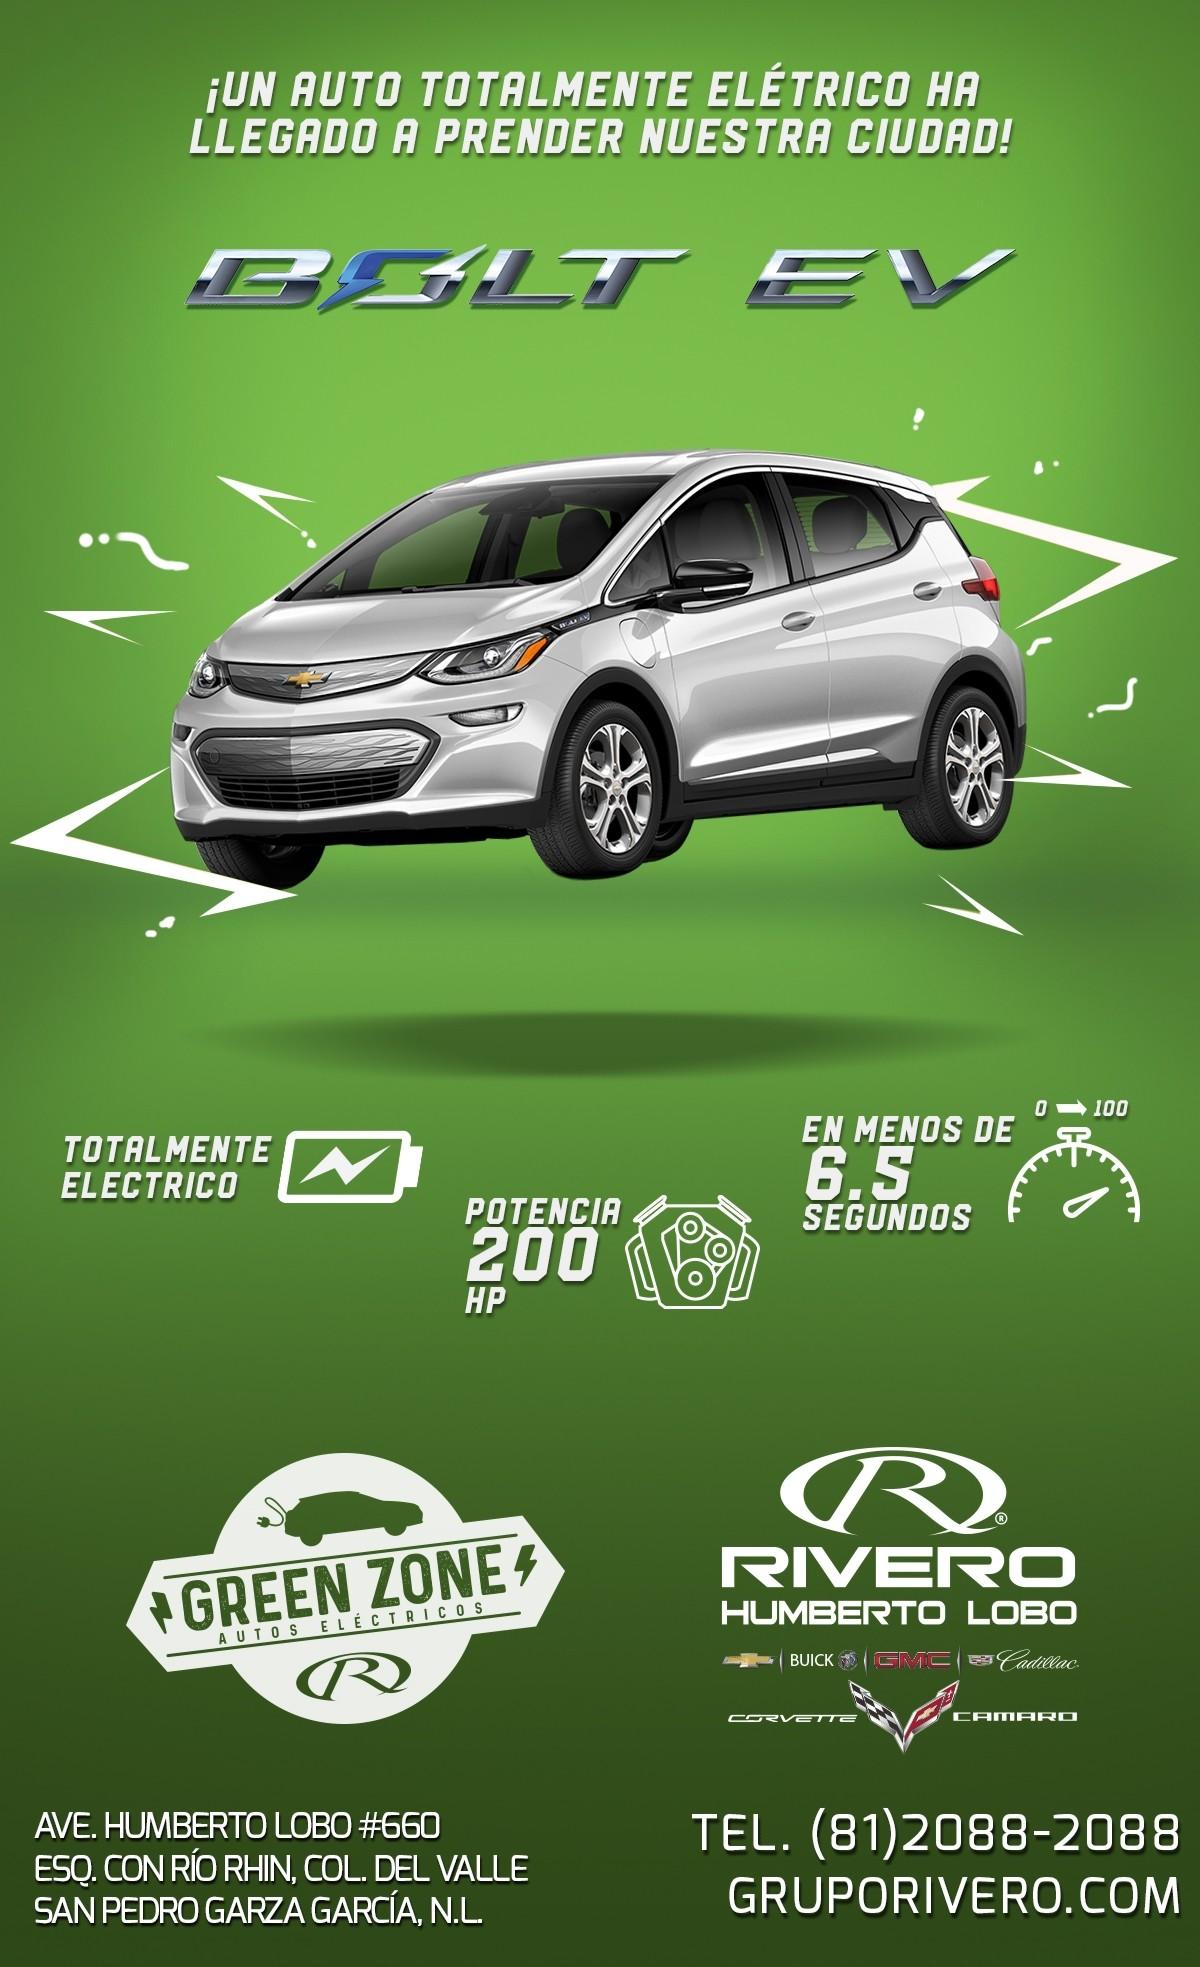 Chevrolet Bolt EV 2017 Autos Eléctricos En Monterrey